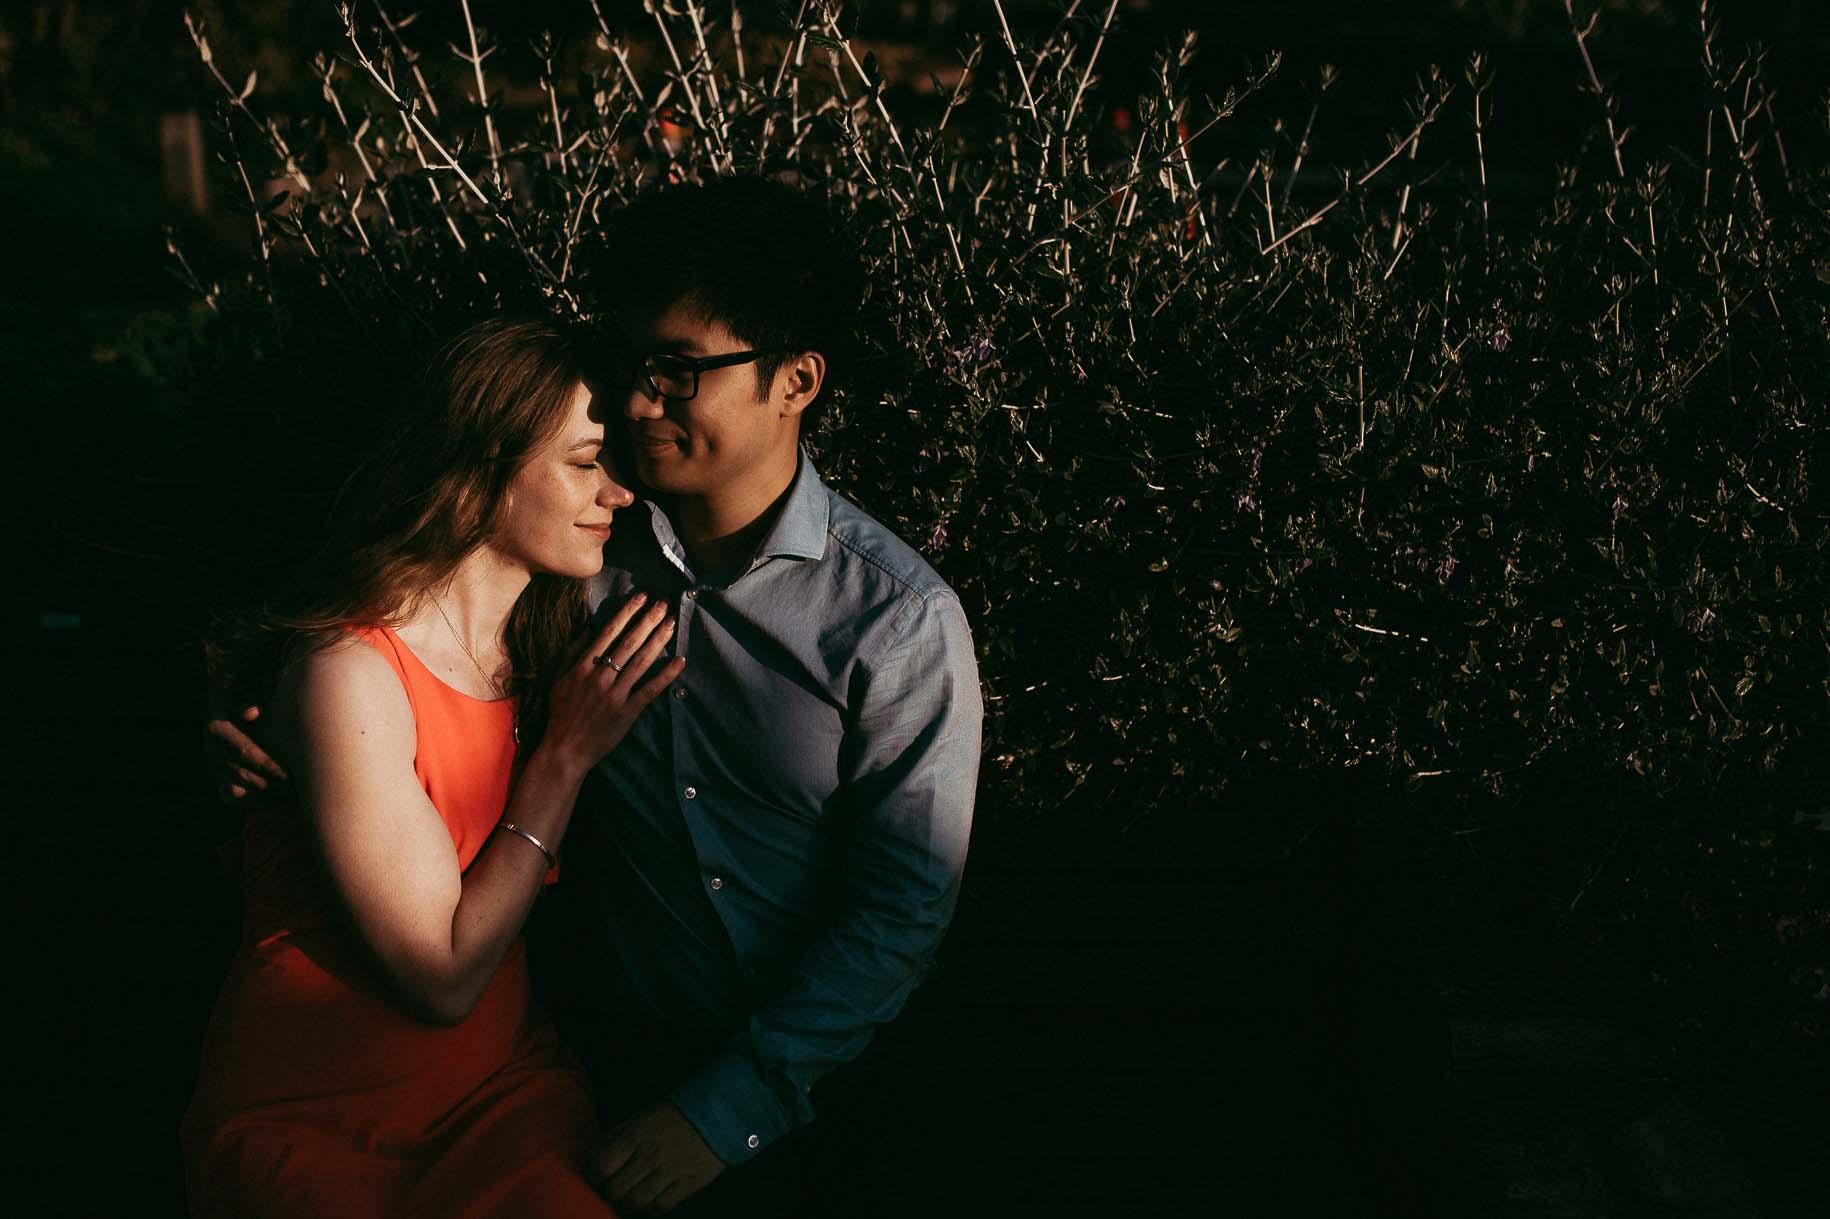 Auckland Botanic Gardens Engagement Session - Spring Cherry Blossom {Hamilton NZ wedding photographer}